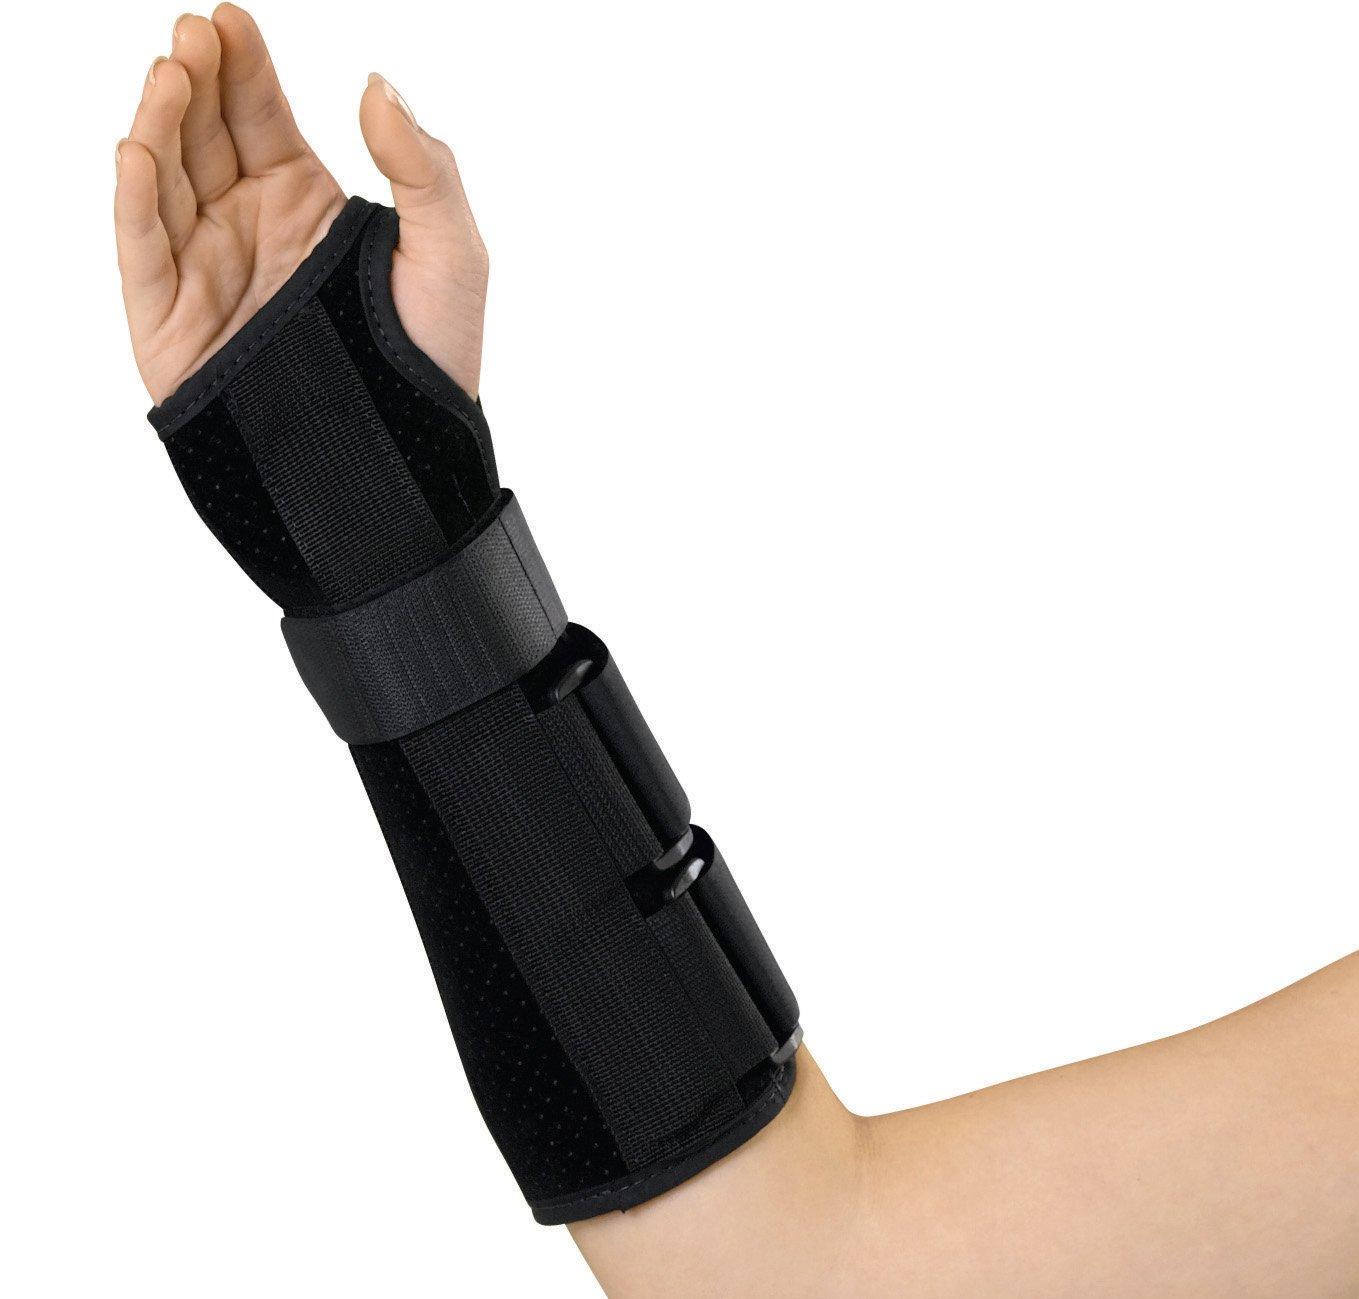 Medline Wrist Right, and Forearm Splint, Right, Large by Medline Large Medline B00A7OL170, ビューティーパーク:c56980f1 --- ijpba.info